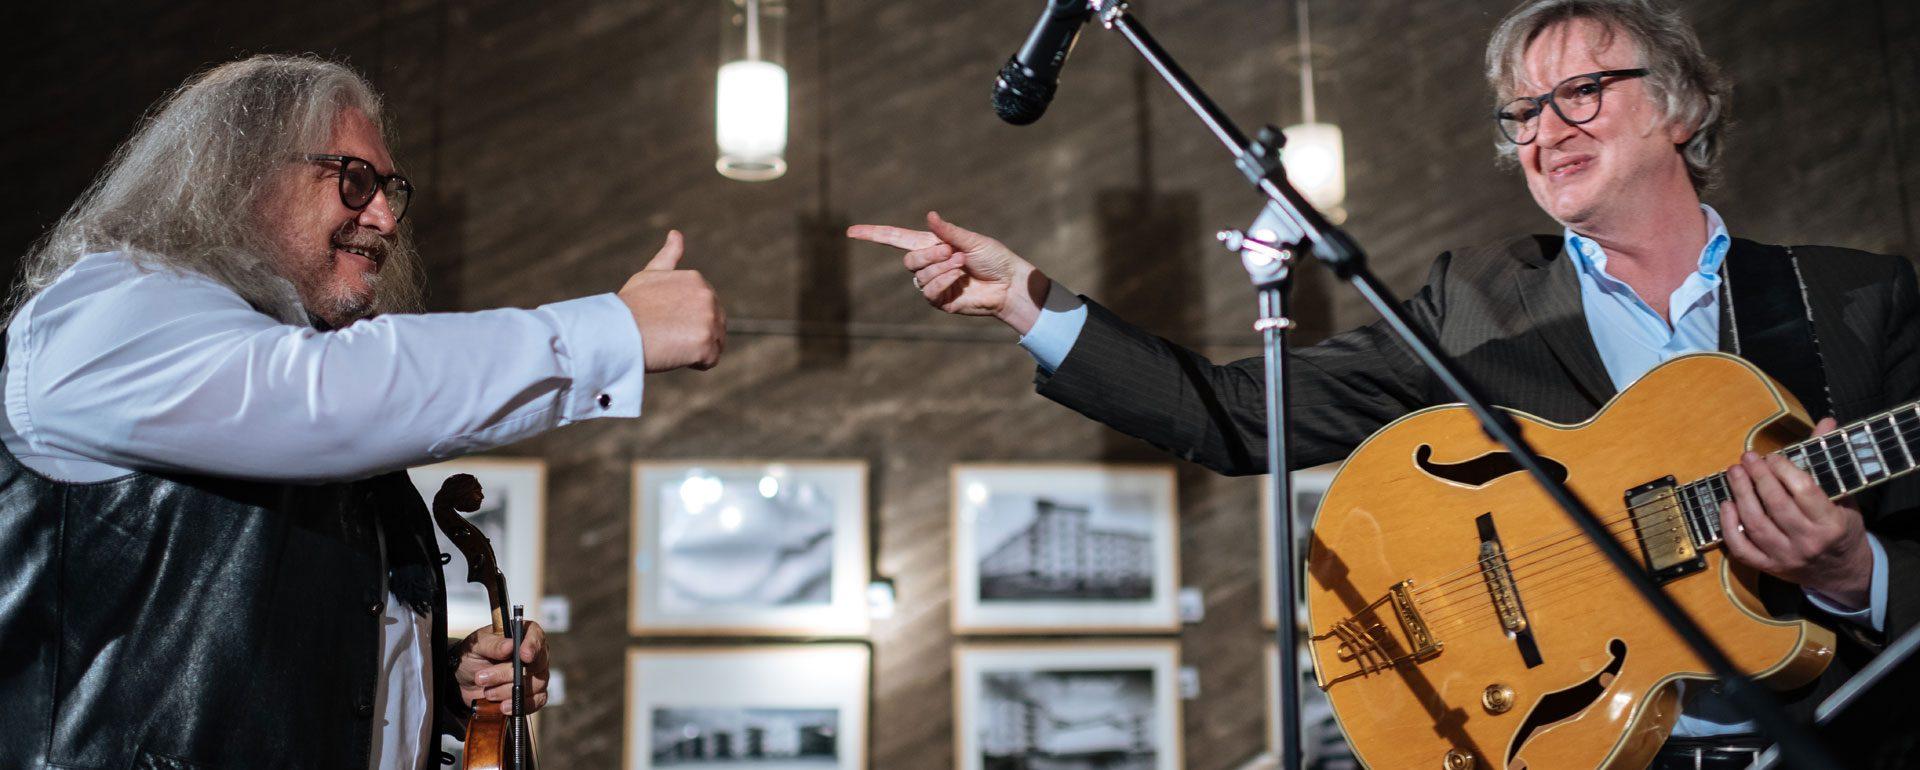 willy ketzer igor epstein vitali eberling museumsnacht 2019 kulturkirche ost köln GAG